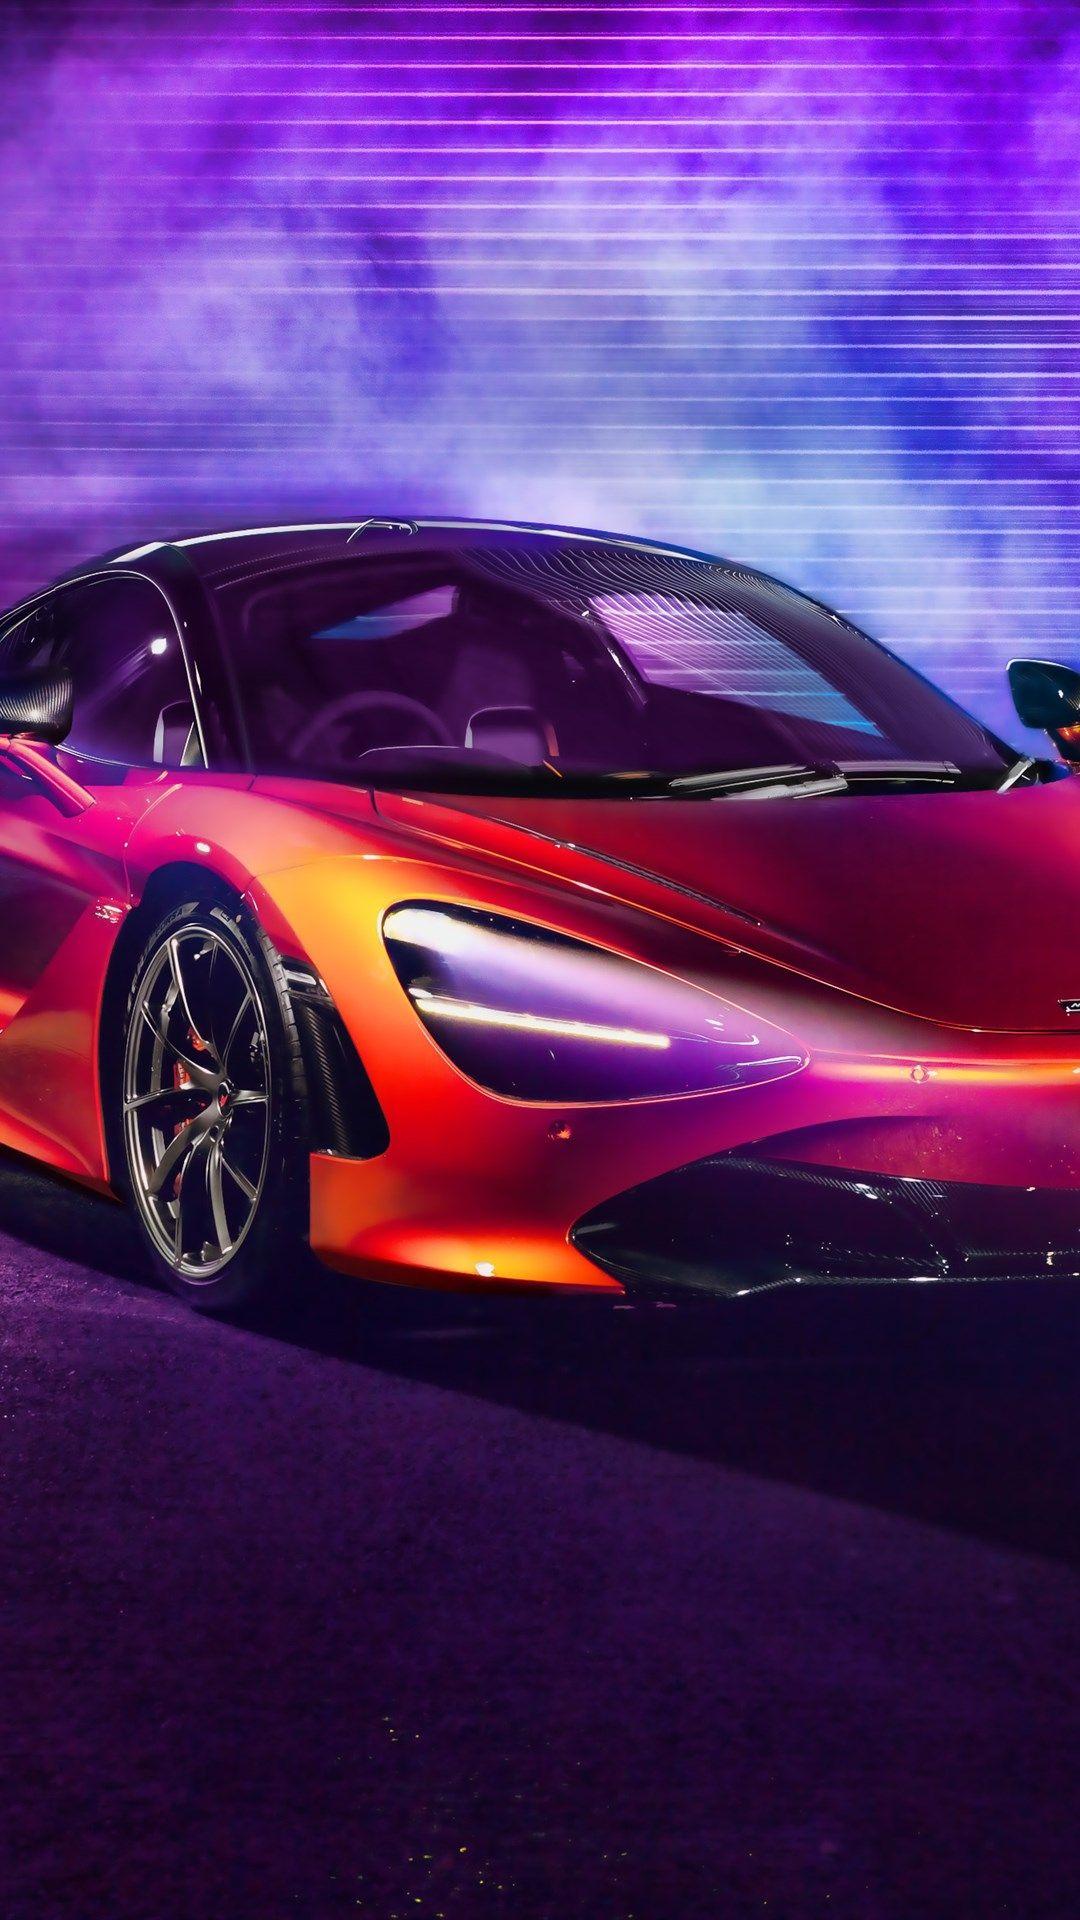 Mclaren 720s 4k Car In Smoke 2019 Cars Hypercars Orange 720s